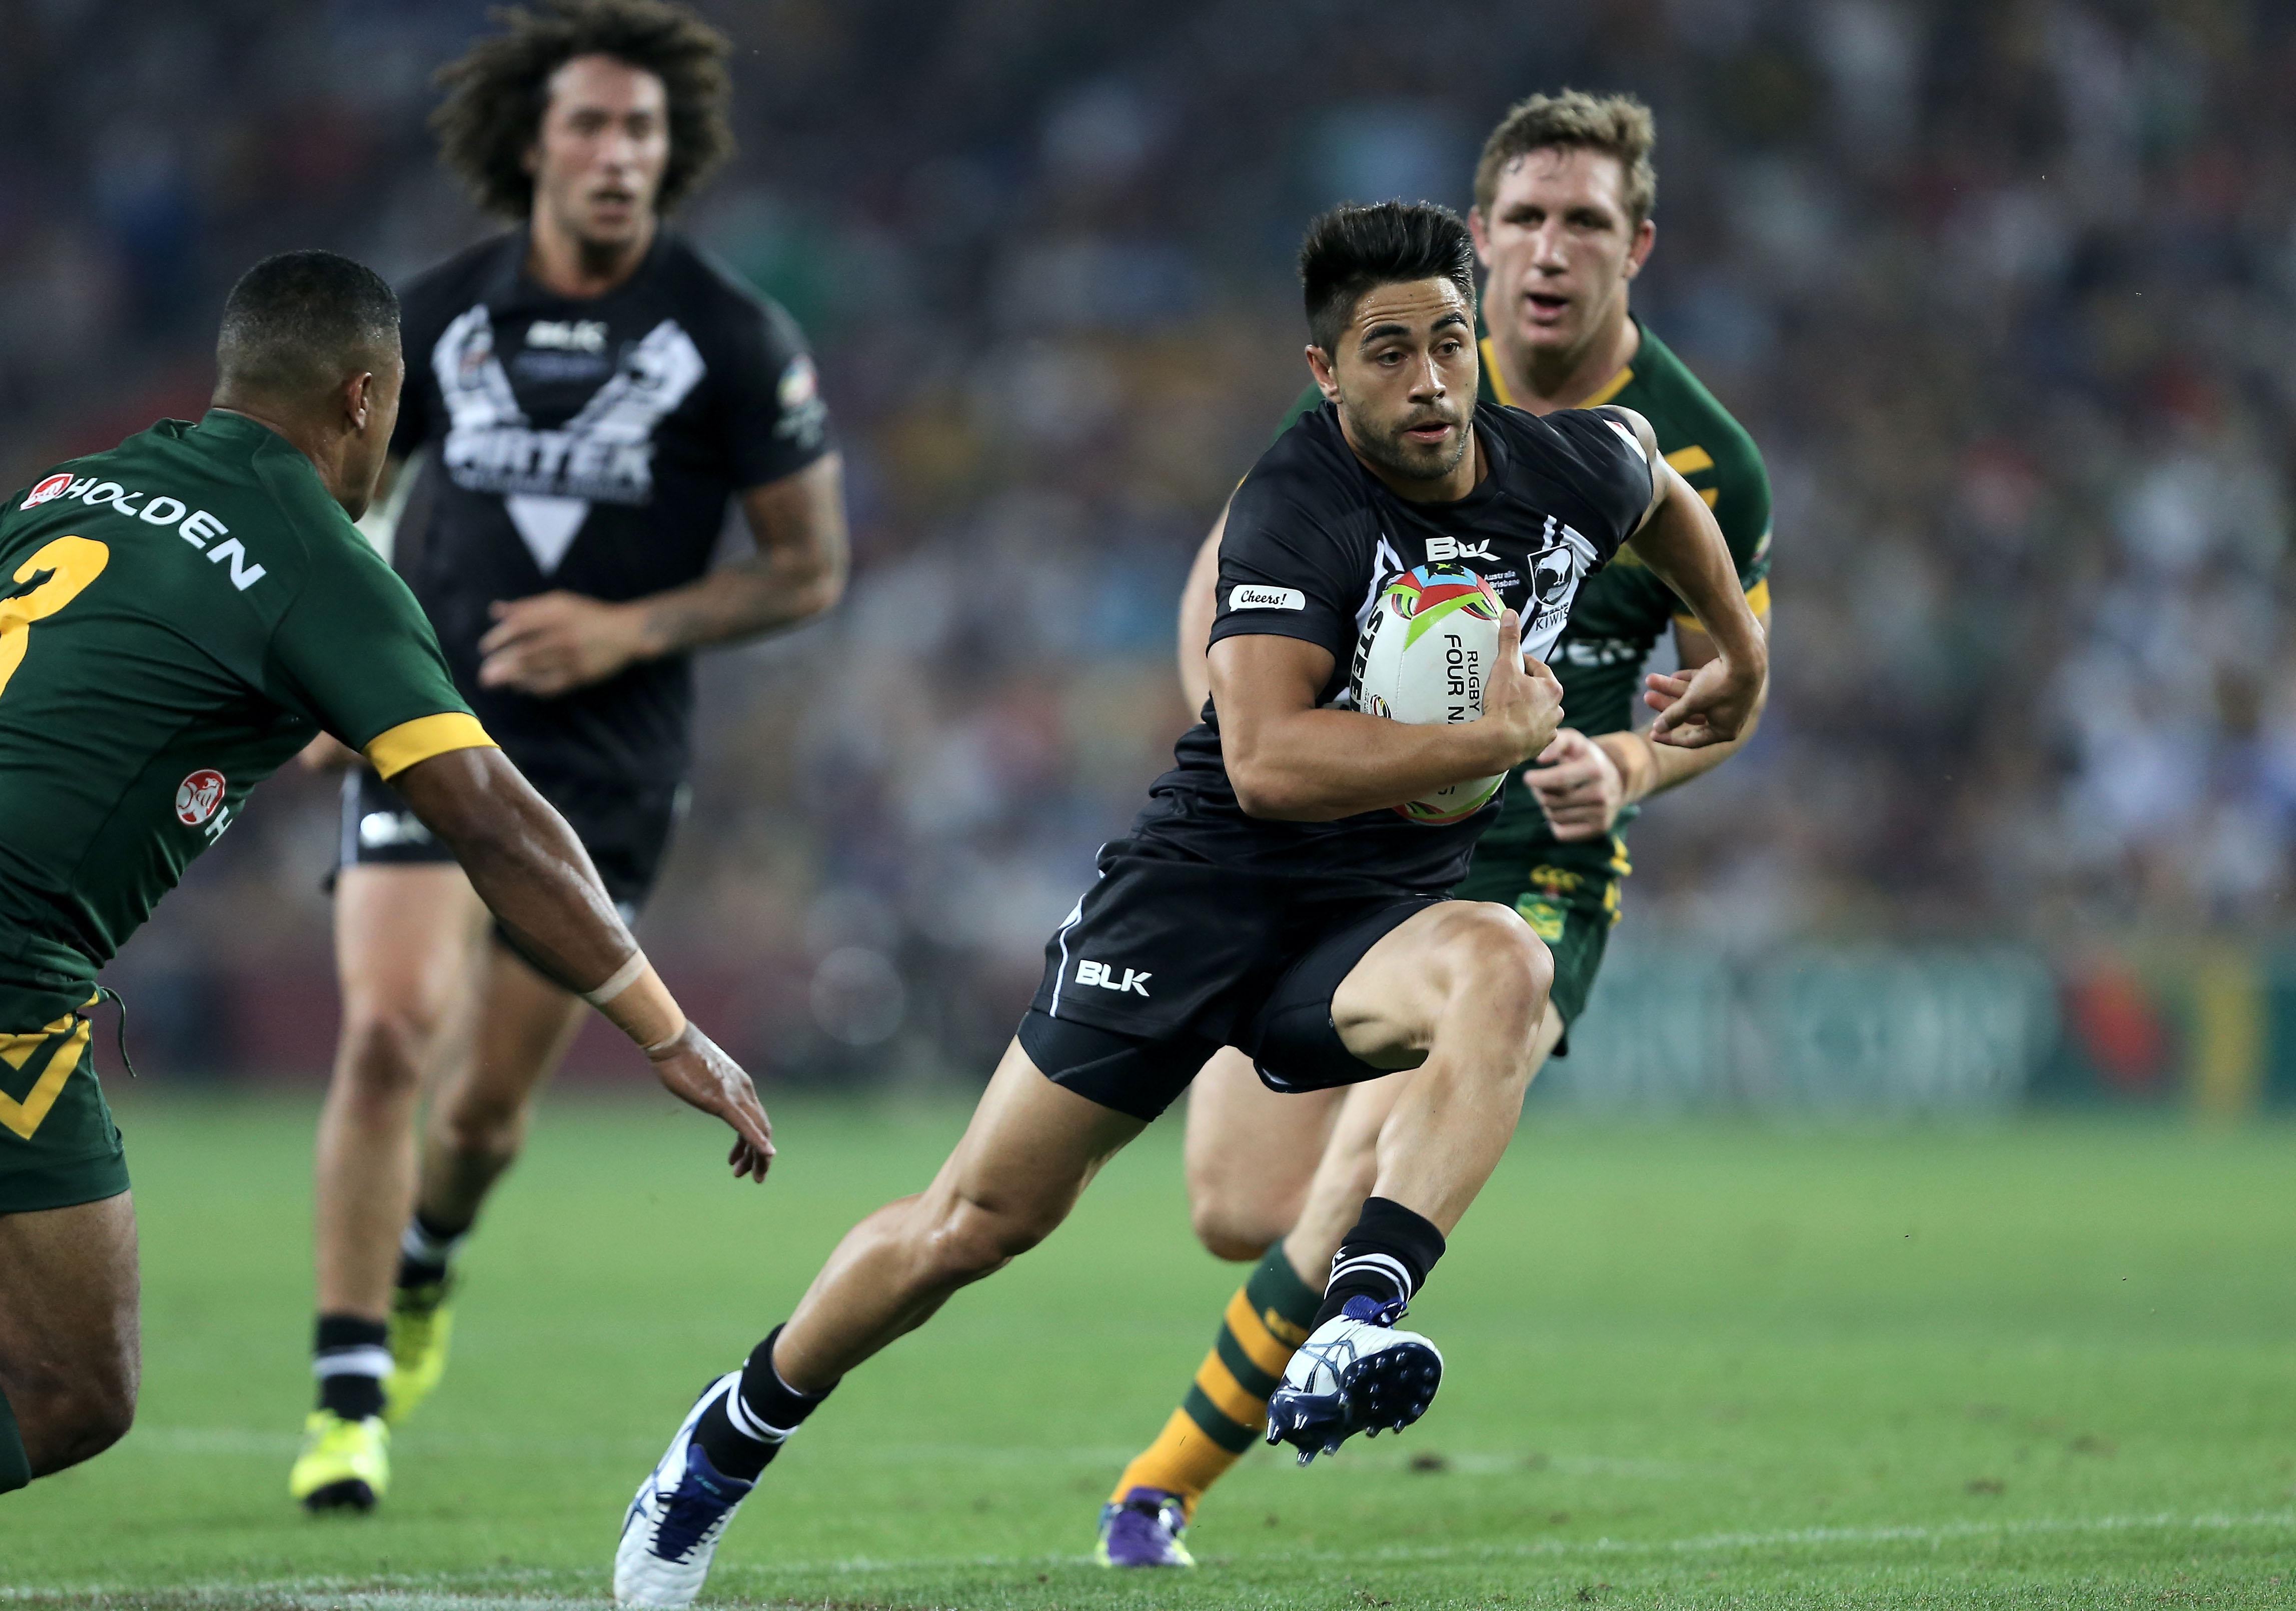 Australian Kangaroos v New Zealand Kiwis Match Preview